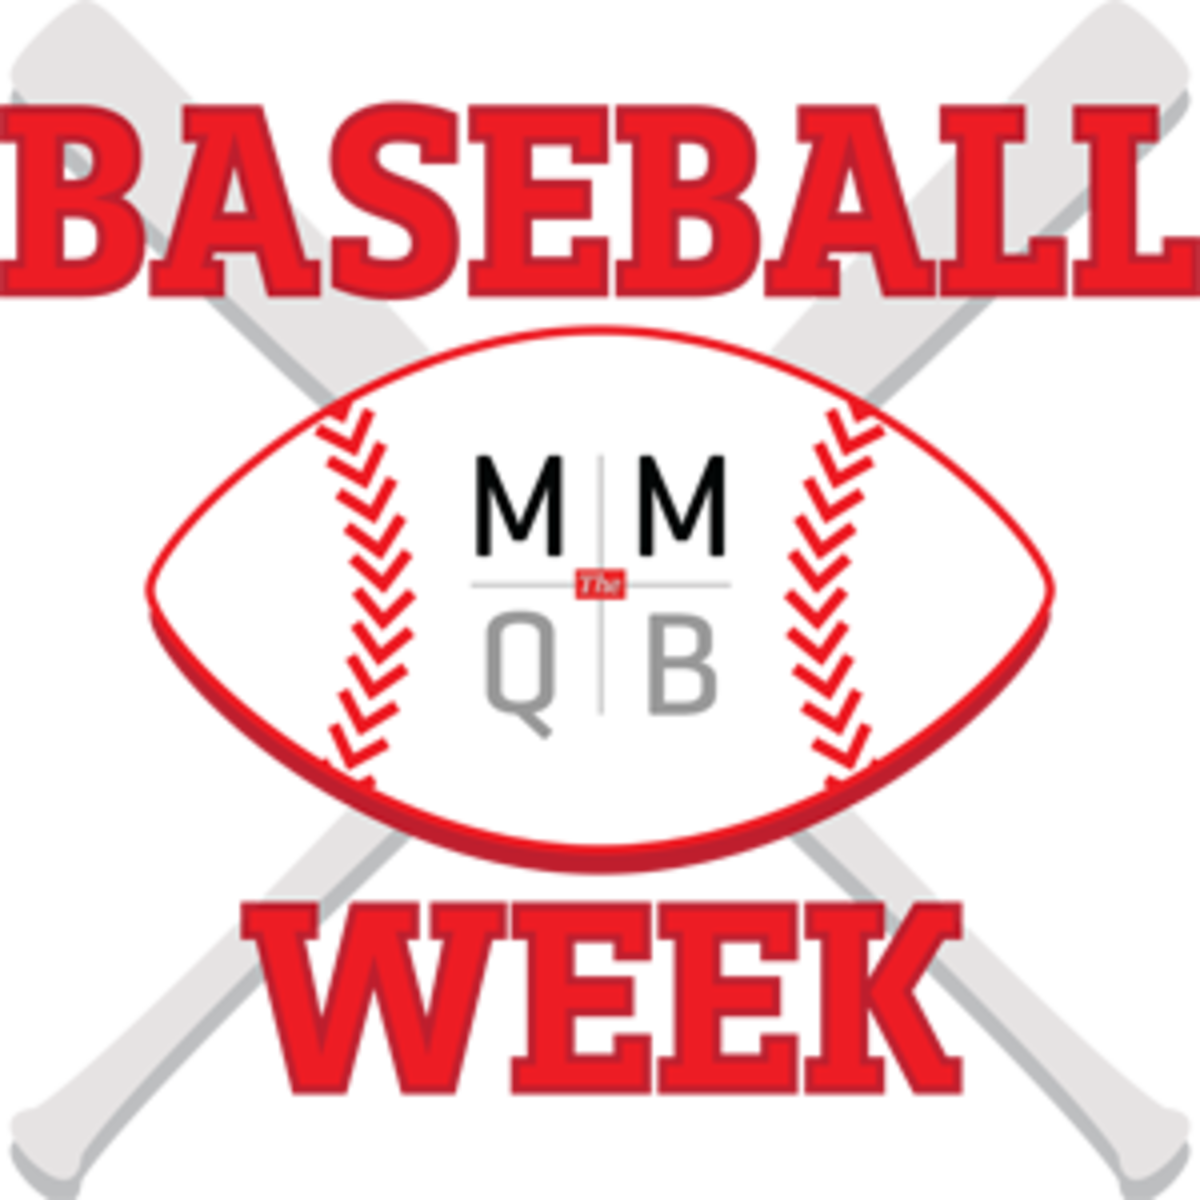 mmqb-baseball-week-logo-300w.png